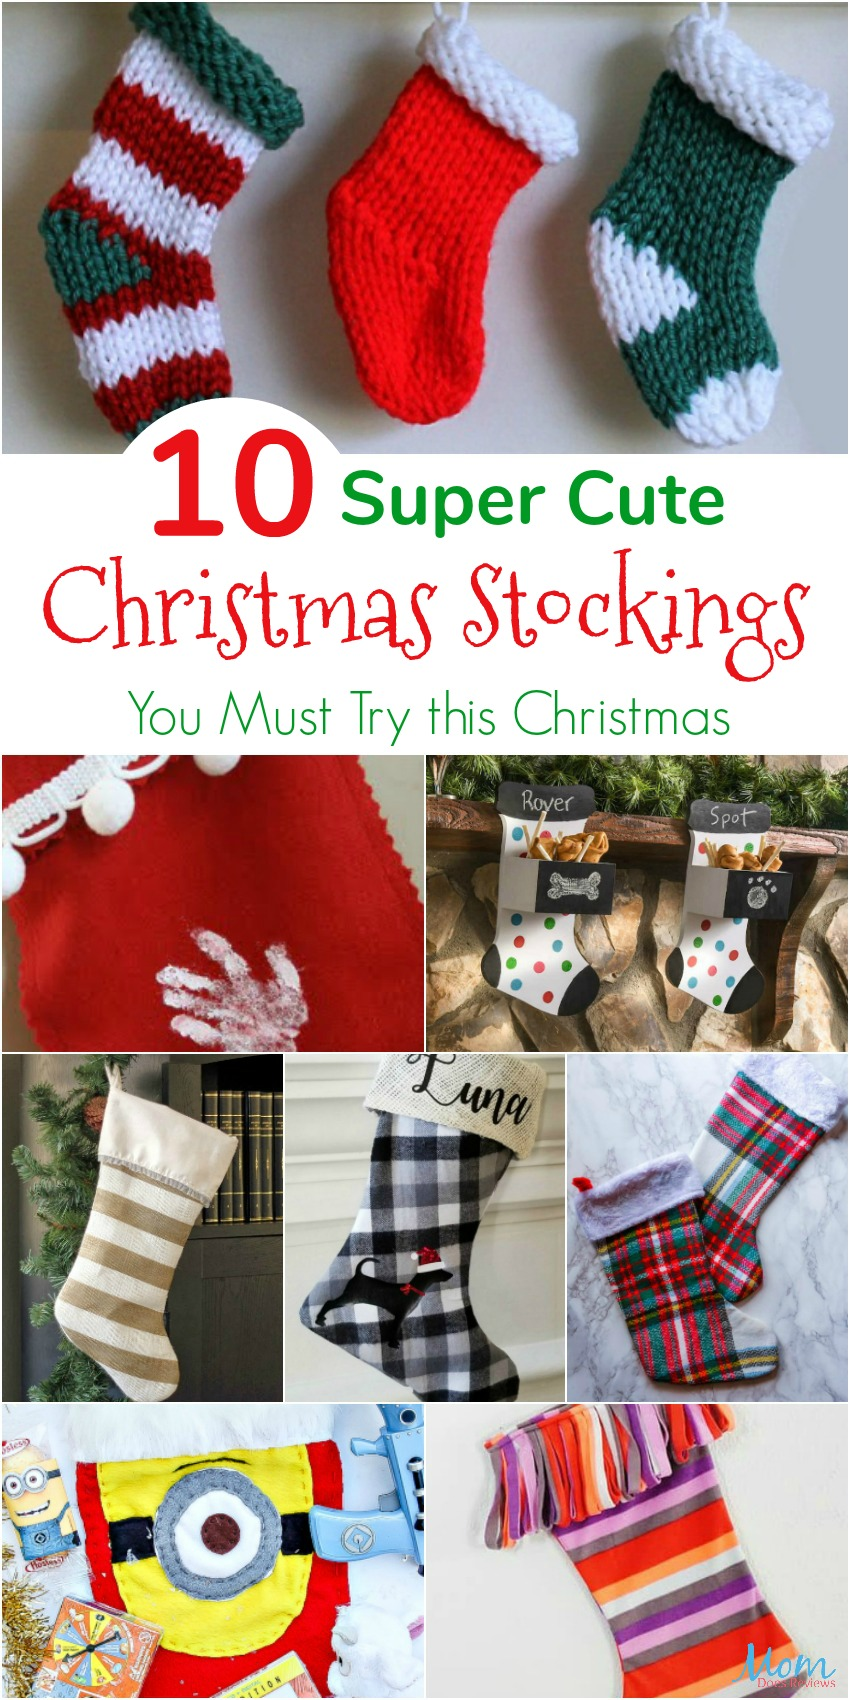 10 Super Cute DIY Christmas Stockings You Must Try this Christmas #DIY #crafts #christmas #crafty #christmascrafts